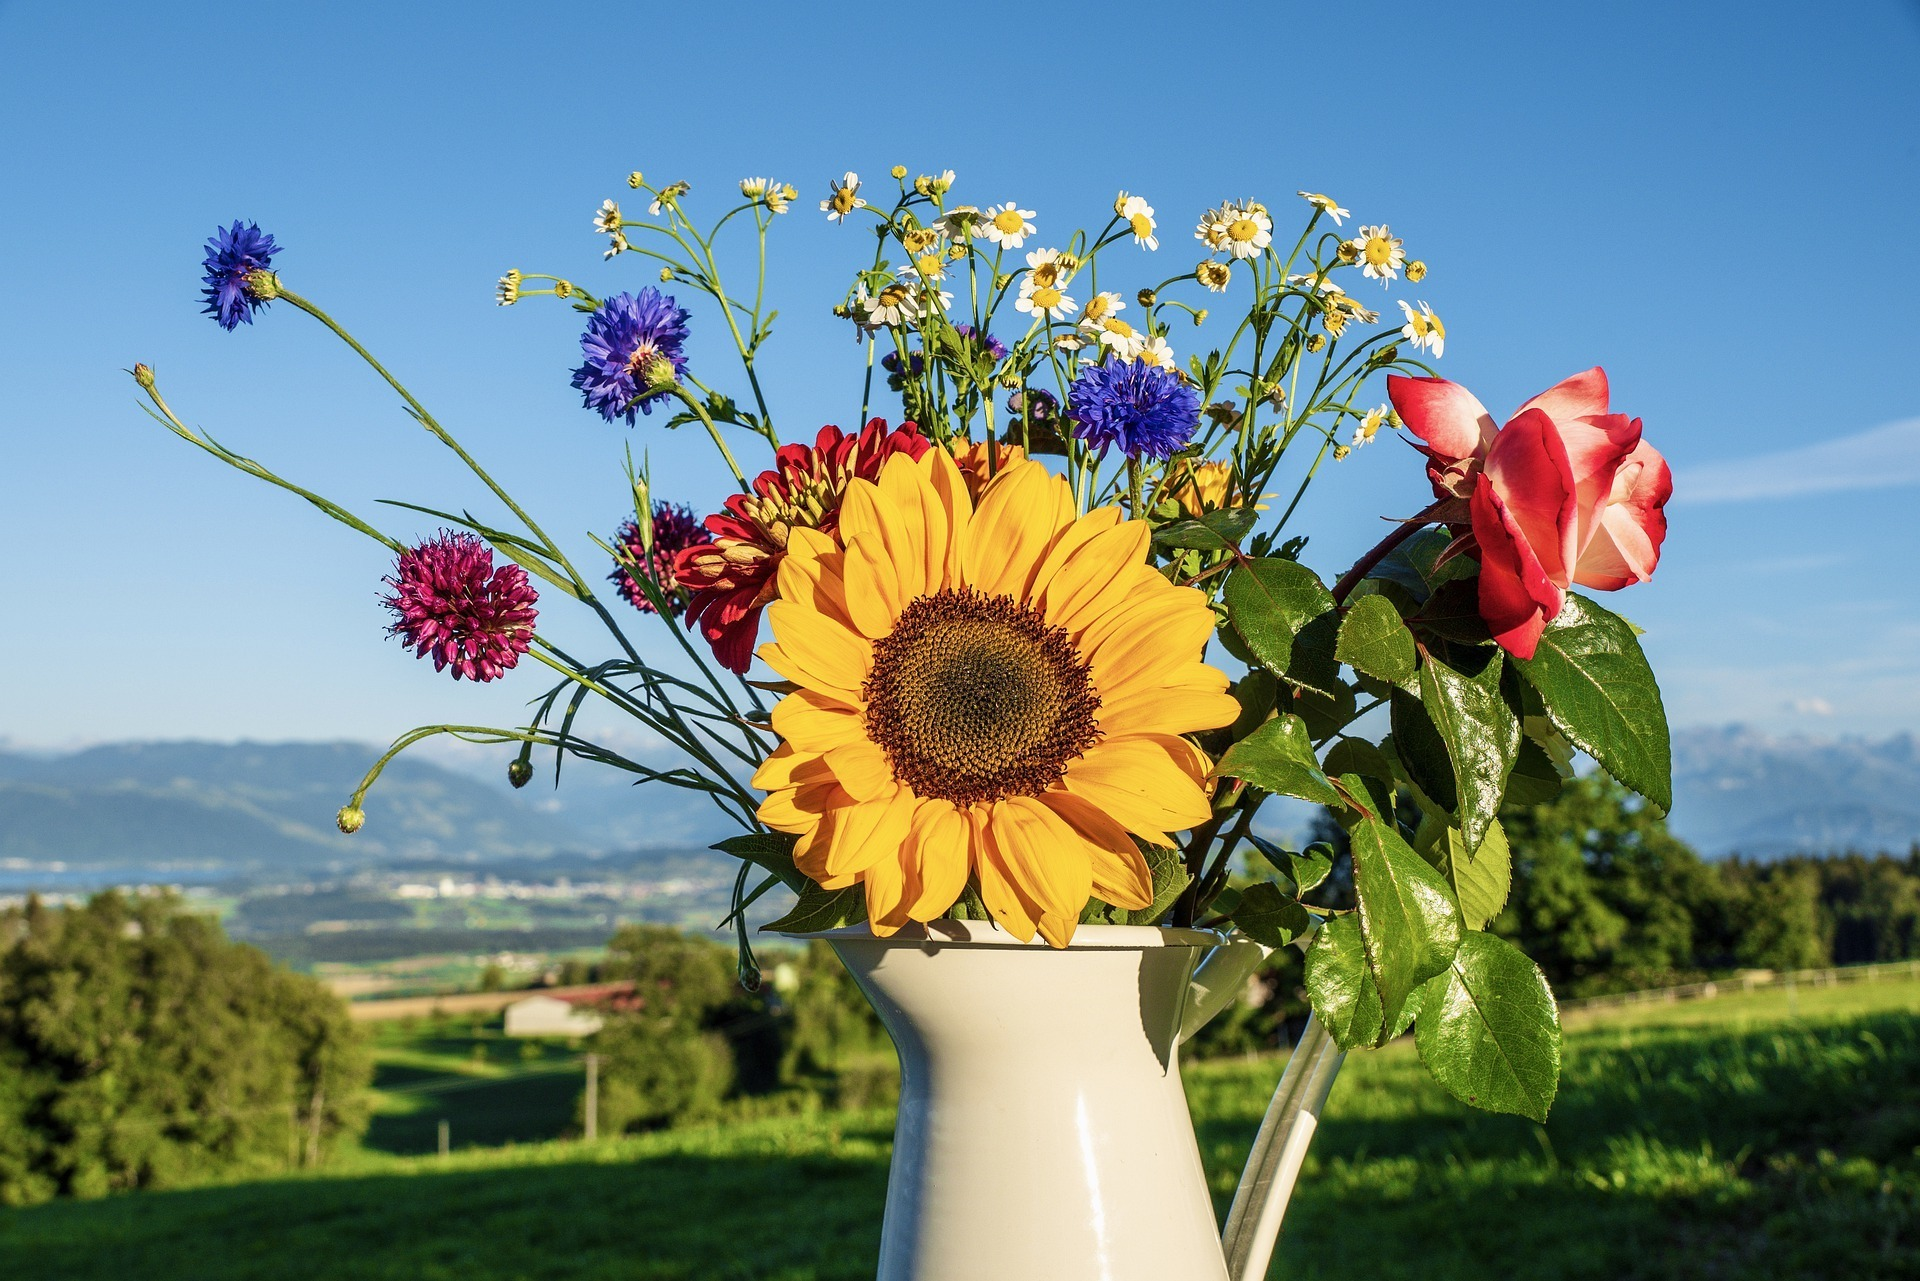 bouquet-of-flowers-5391136_1920